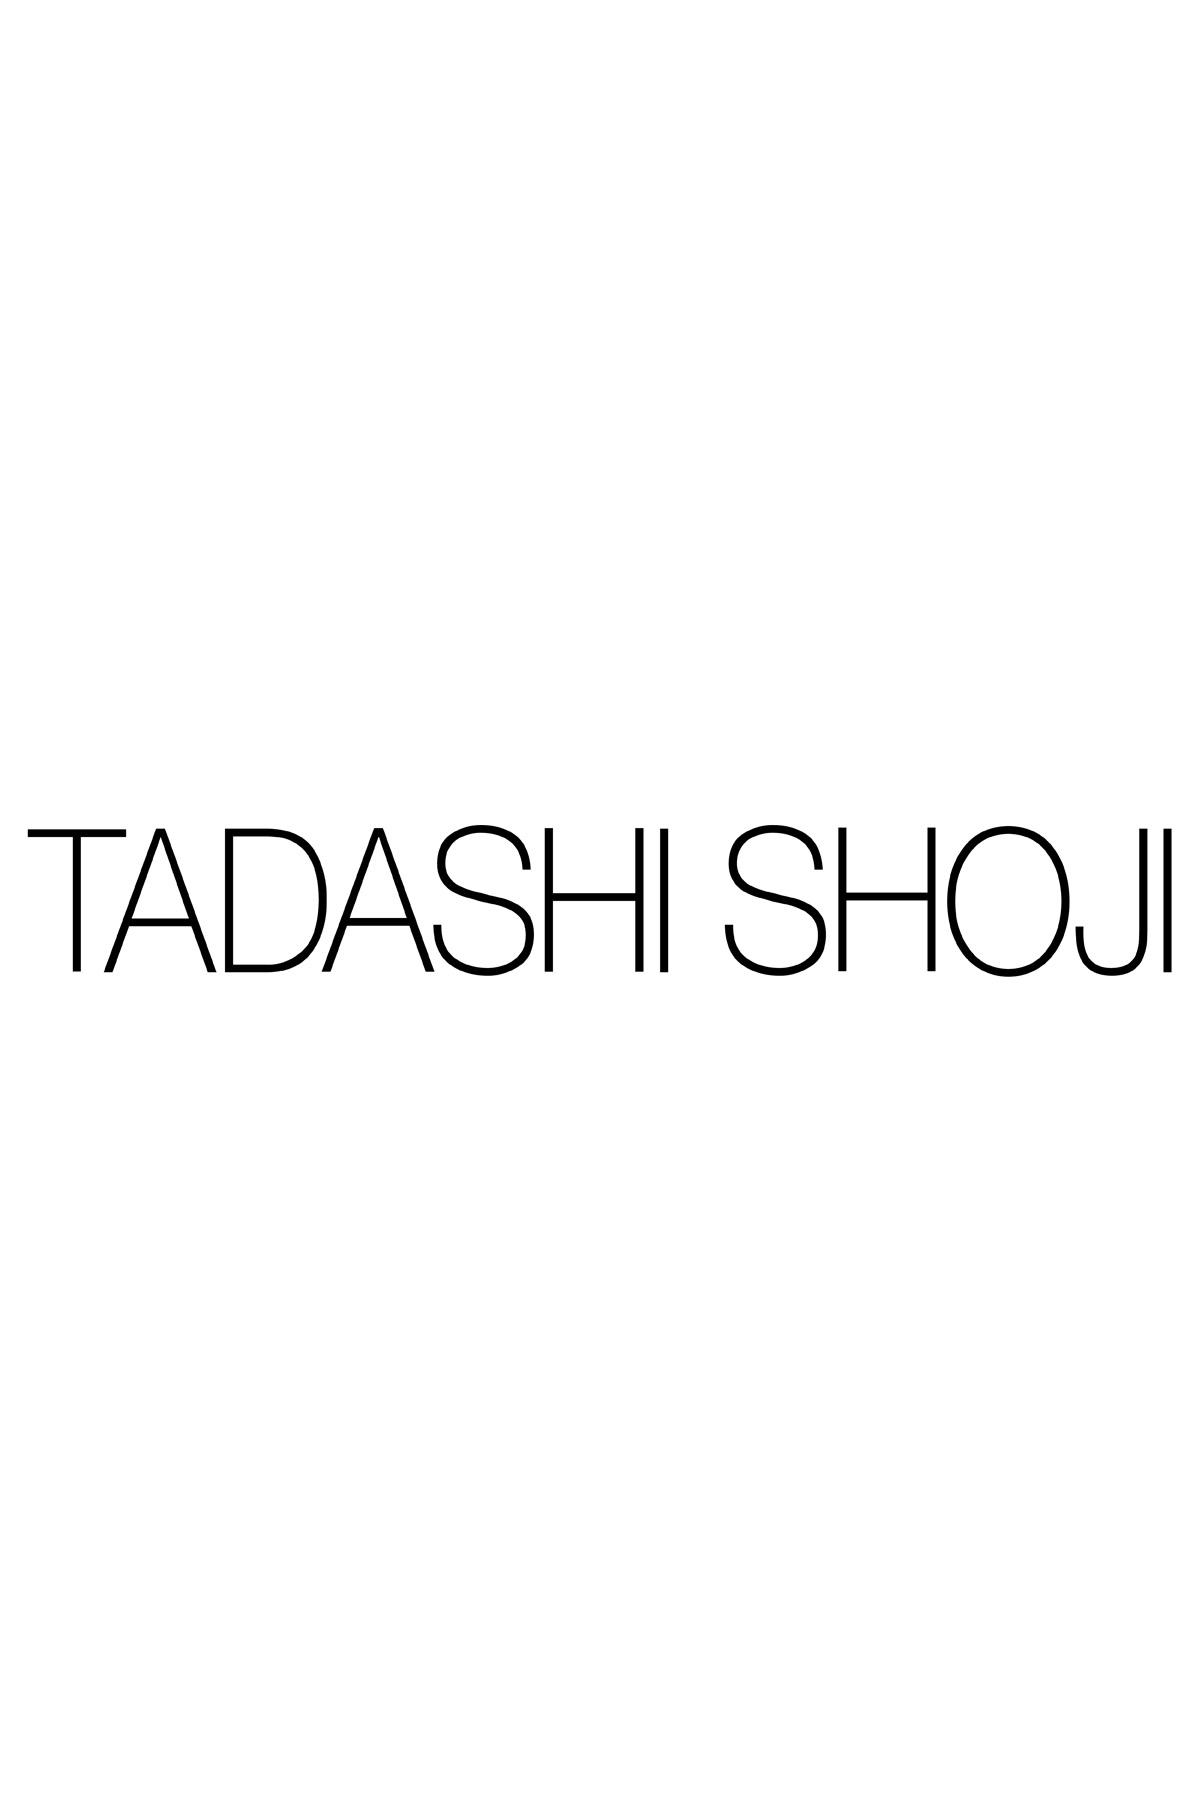 Tadashi Shoji Plus Size - Corded Embroidery on Tulle Boatneck Dress - Detail